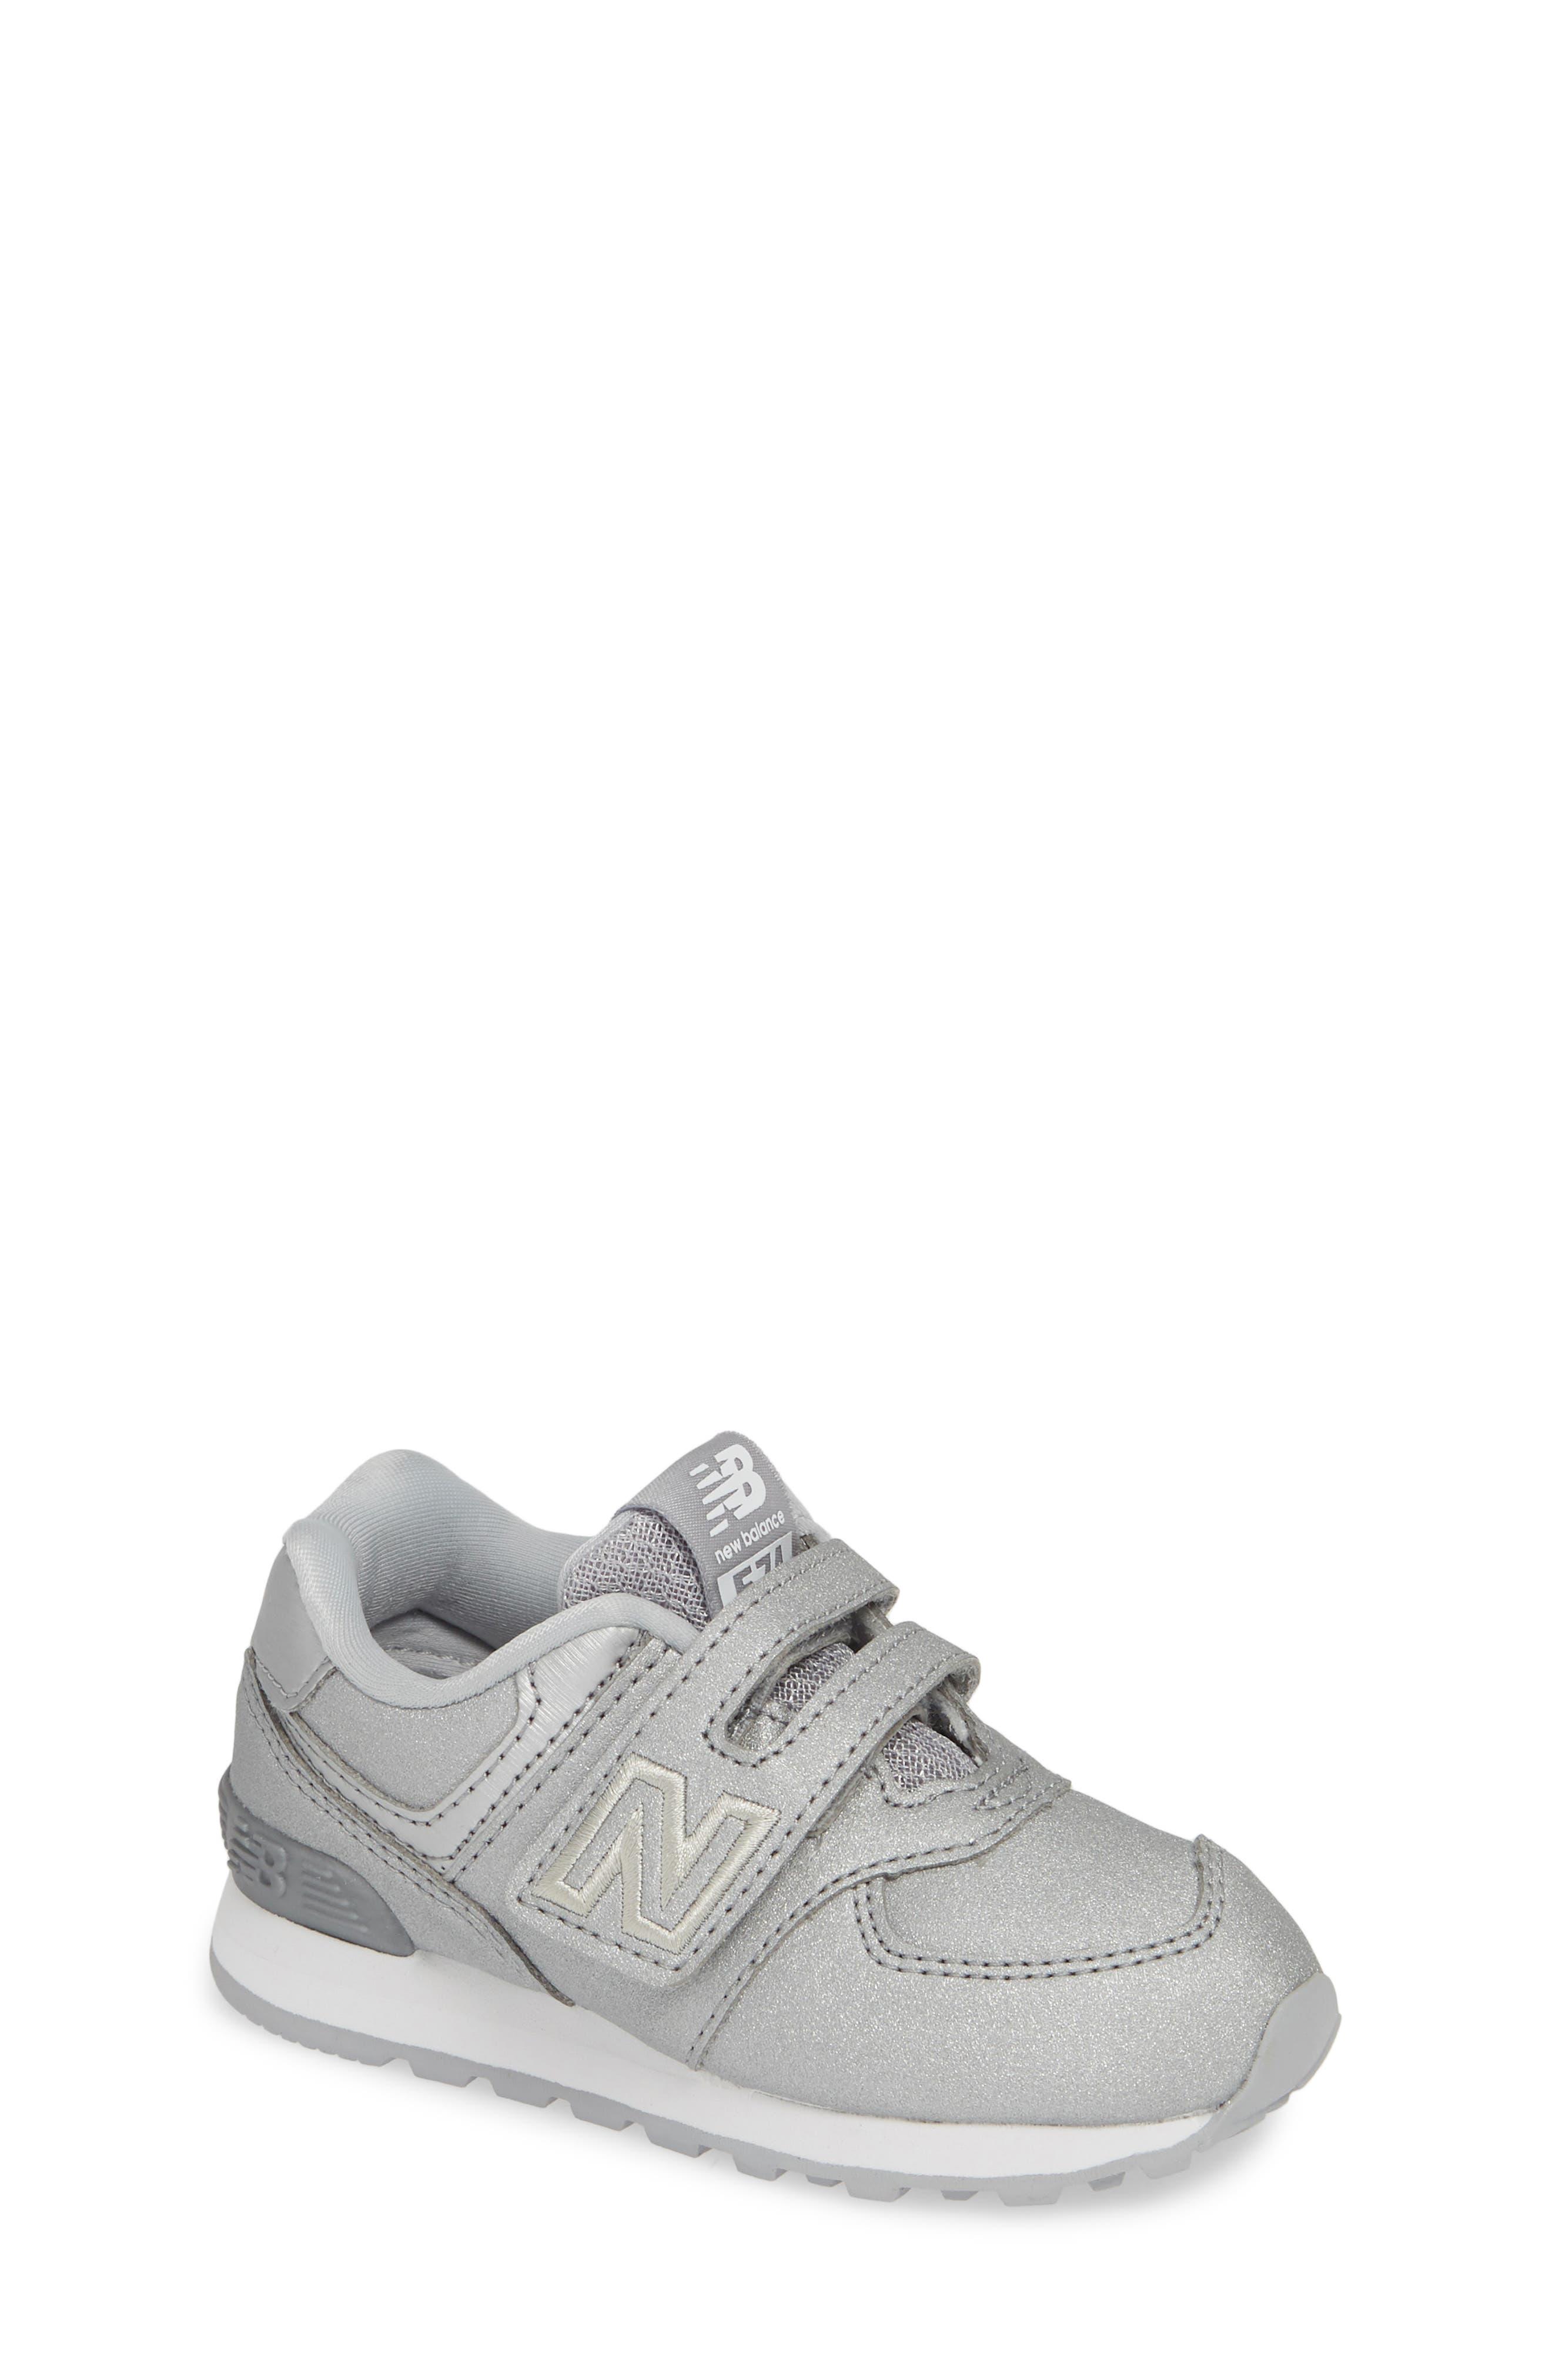 Toddler Girls New Balance 574 Essentials Glitter Sneaker Size 105 M  Metallic